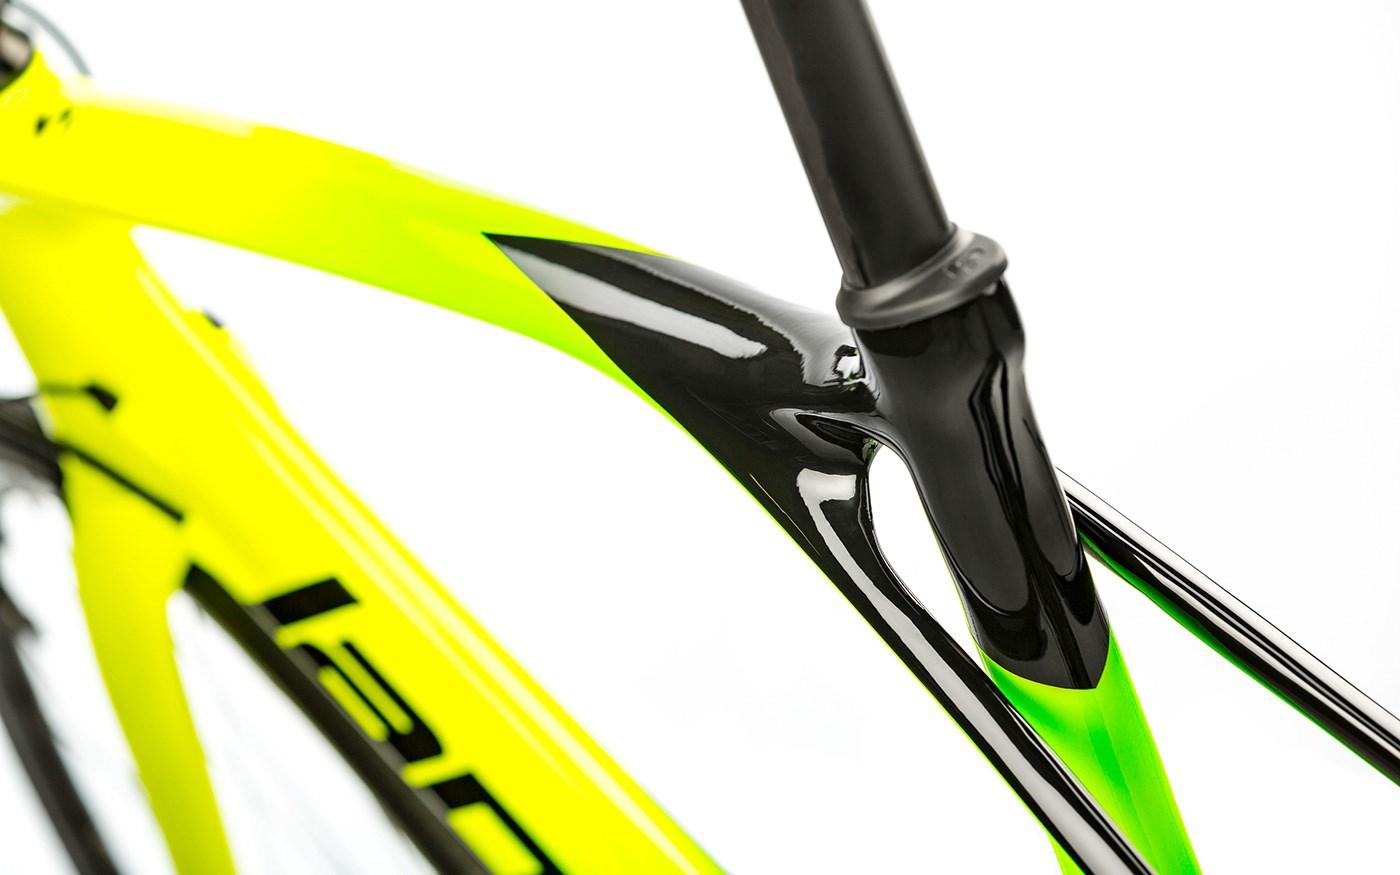 4241e2c7153 Lapierre 2017 Xelius SL 700 Ultimate Disc Carbon Di2 Race Road Bike ...